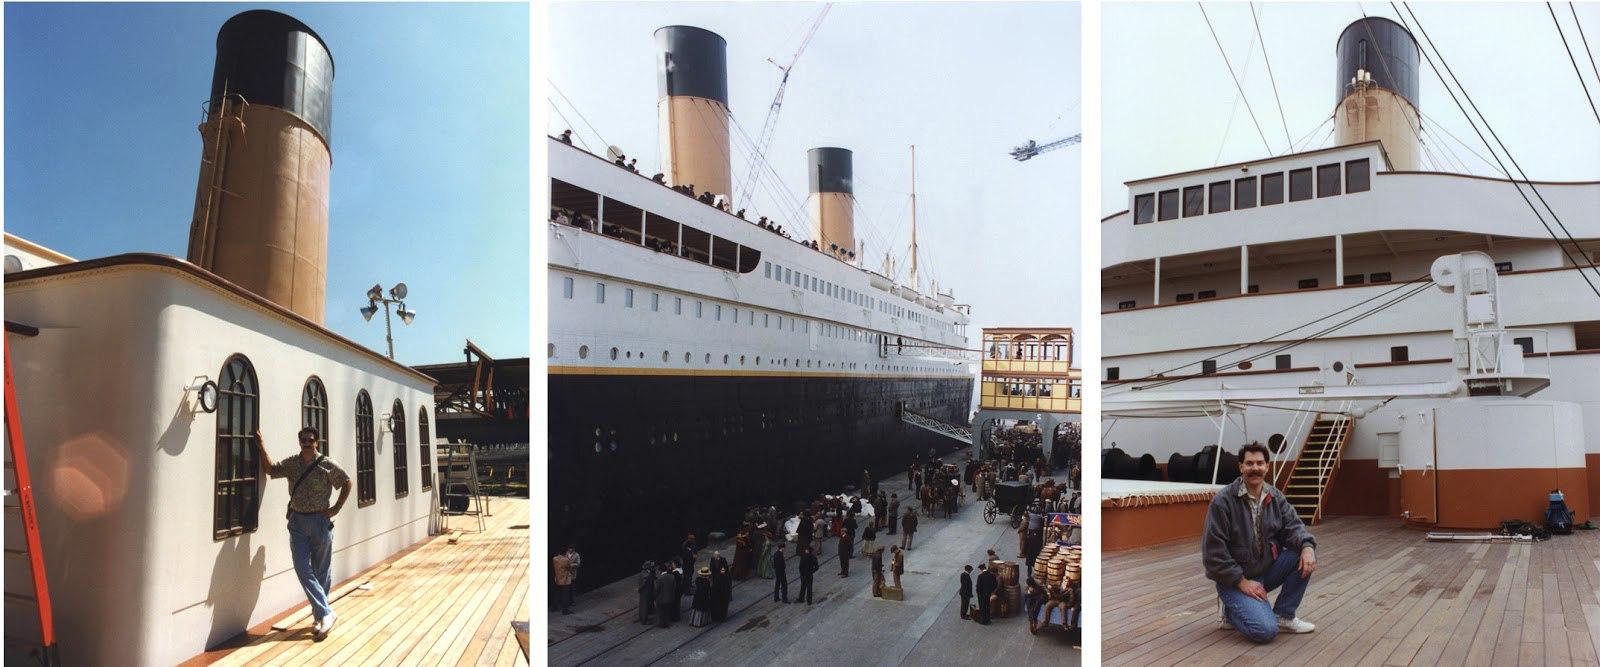 "Кен Маршалл на съёмочной площадке ""Титаника""."